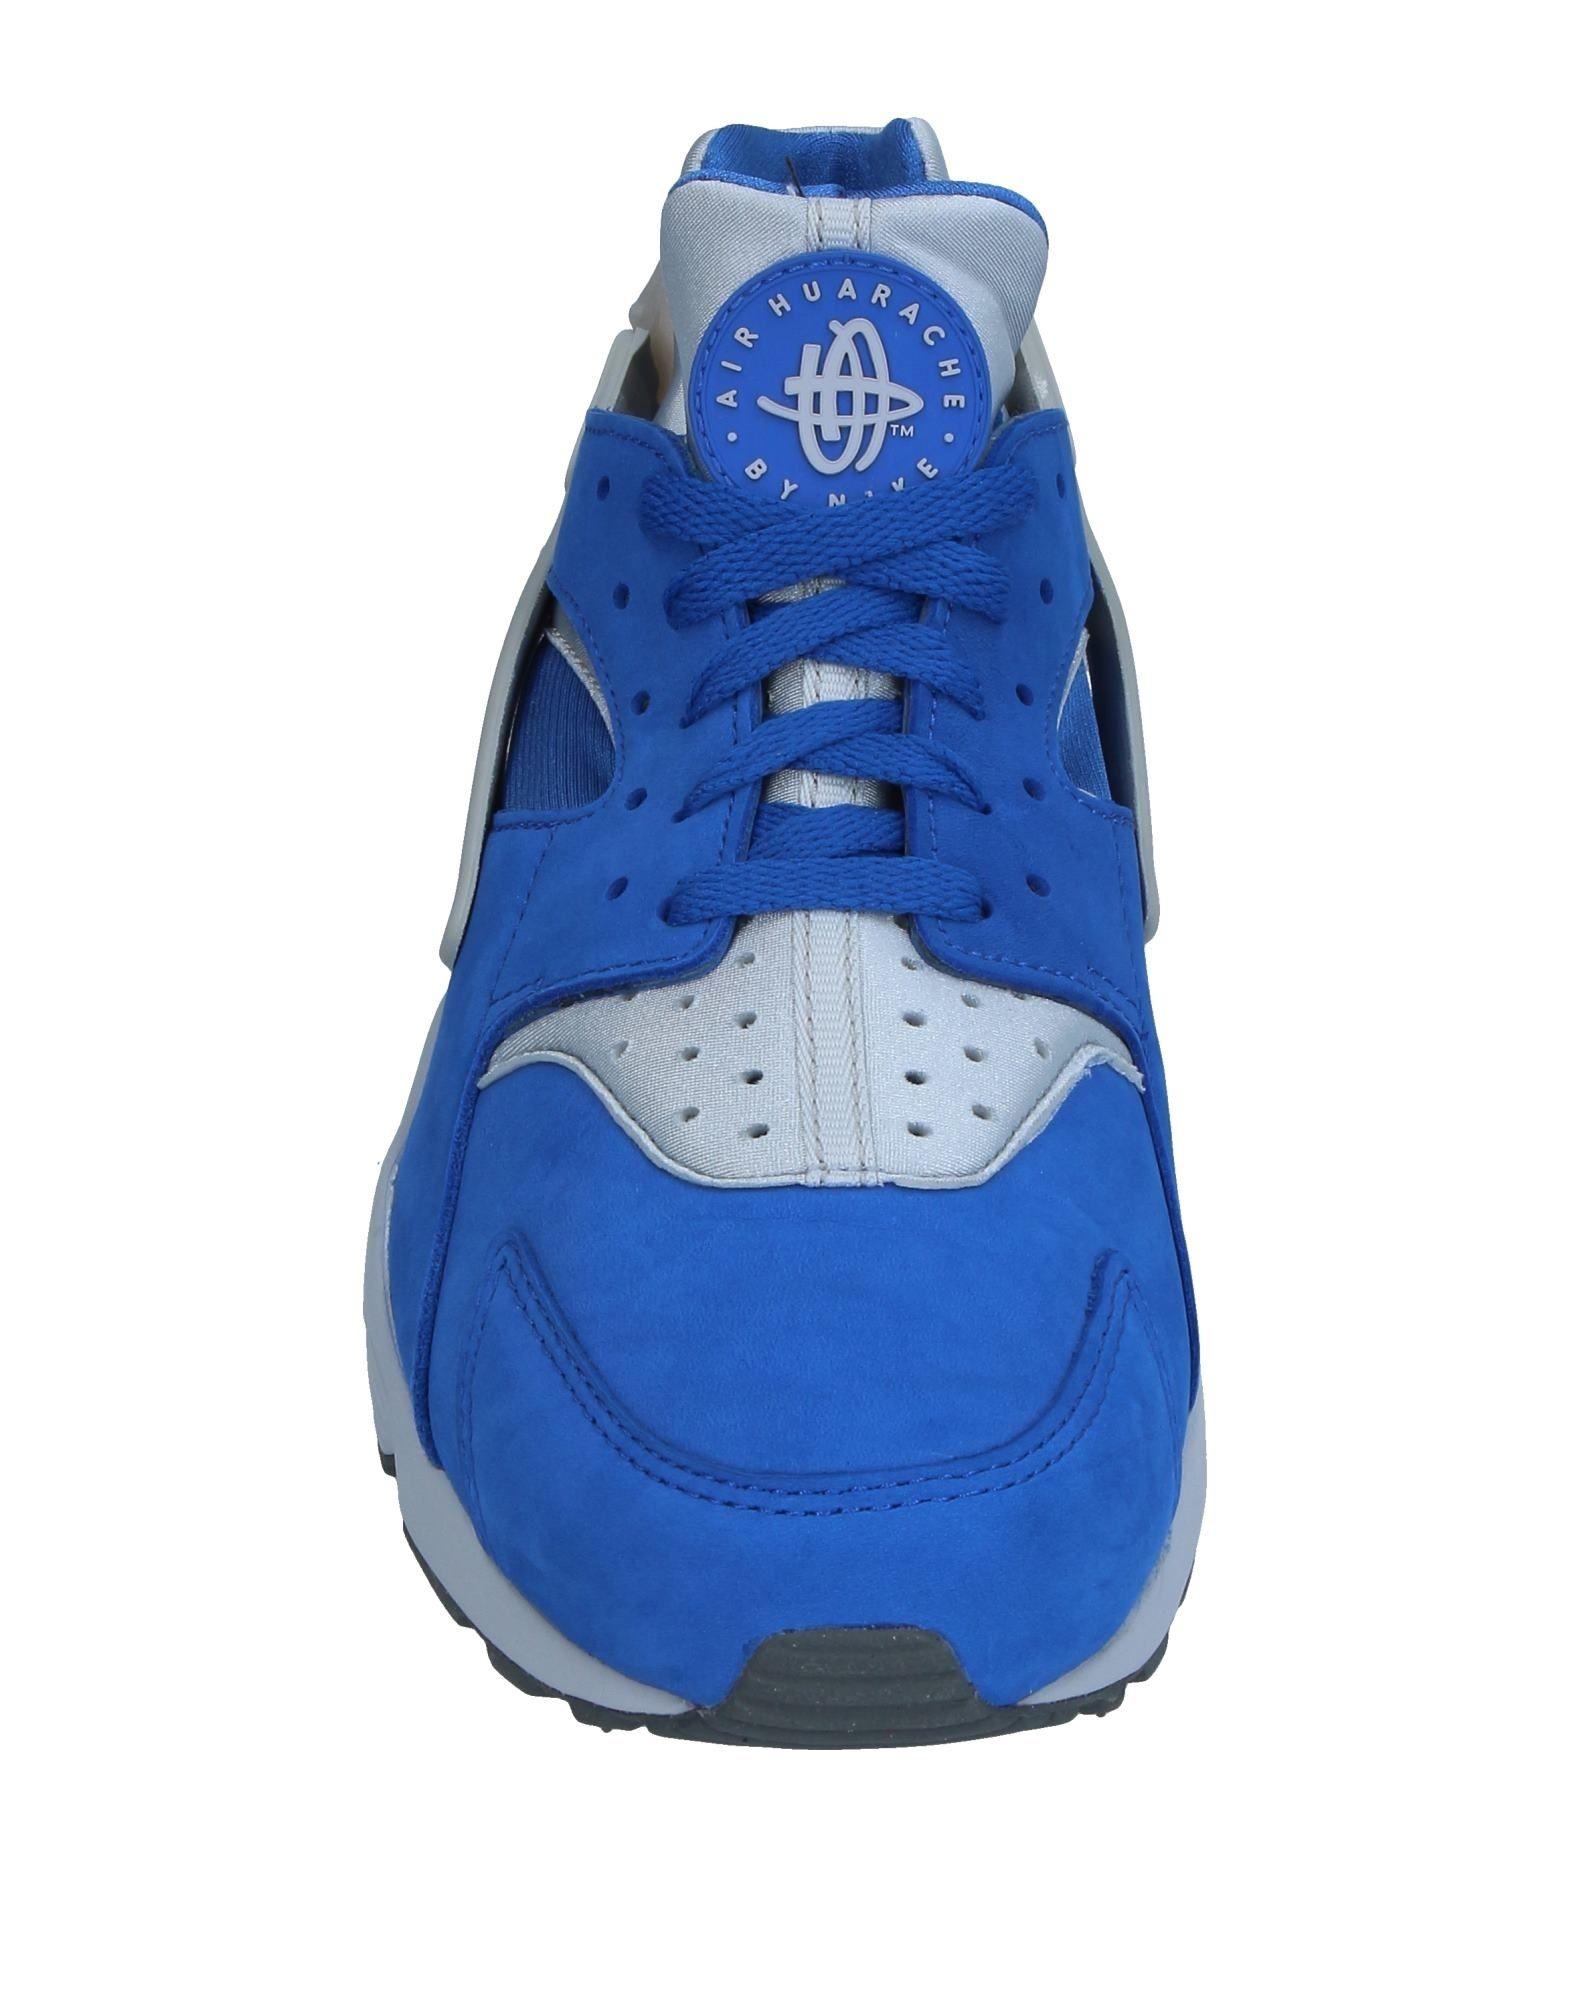 Rabatt echte Sneakers Schuhe Nike Sneakers echte Herren  11332194OJ 3296f0